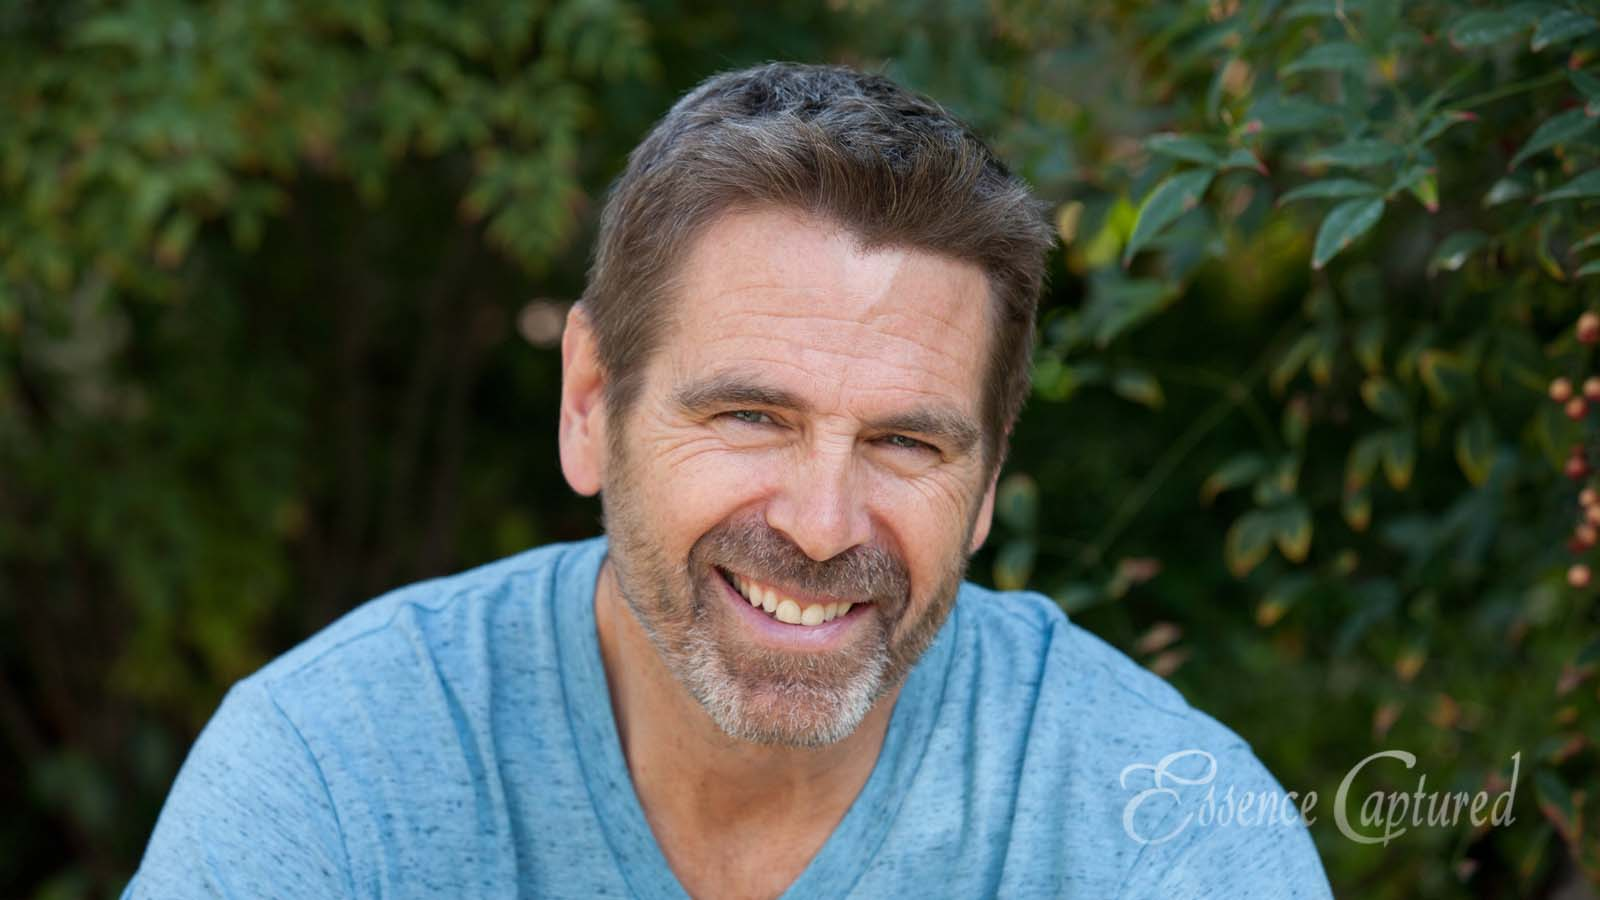 head shot older male facial hair natural background blue shirt